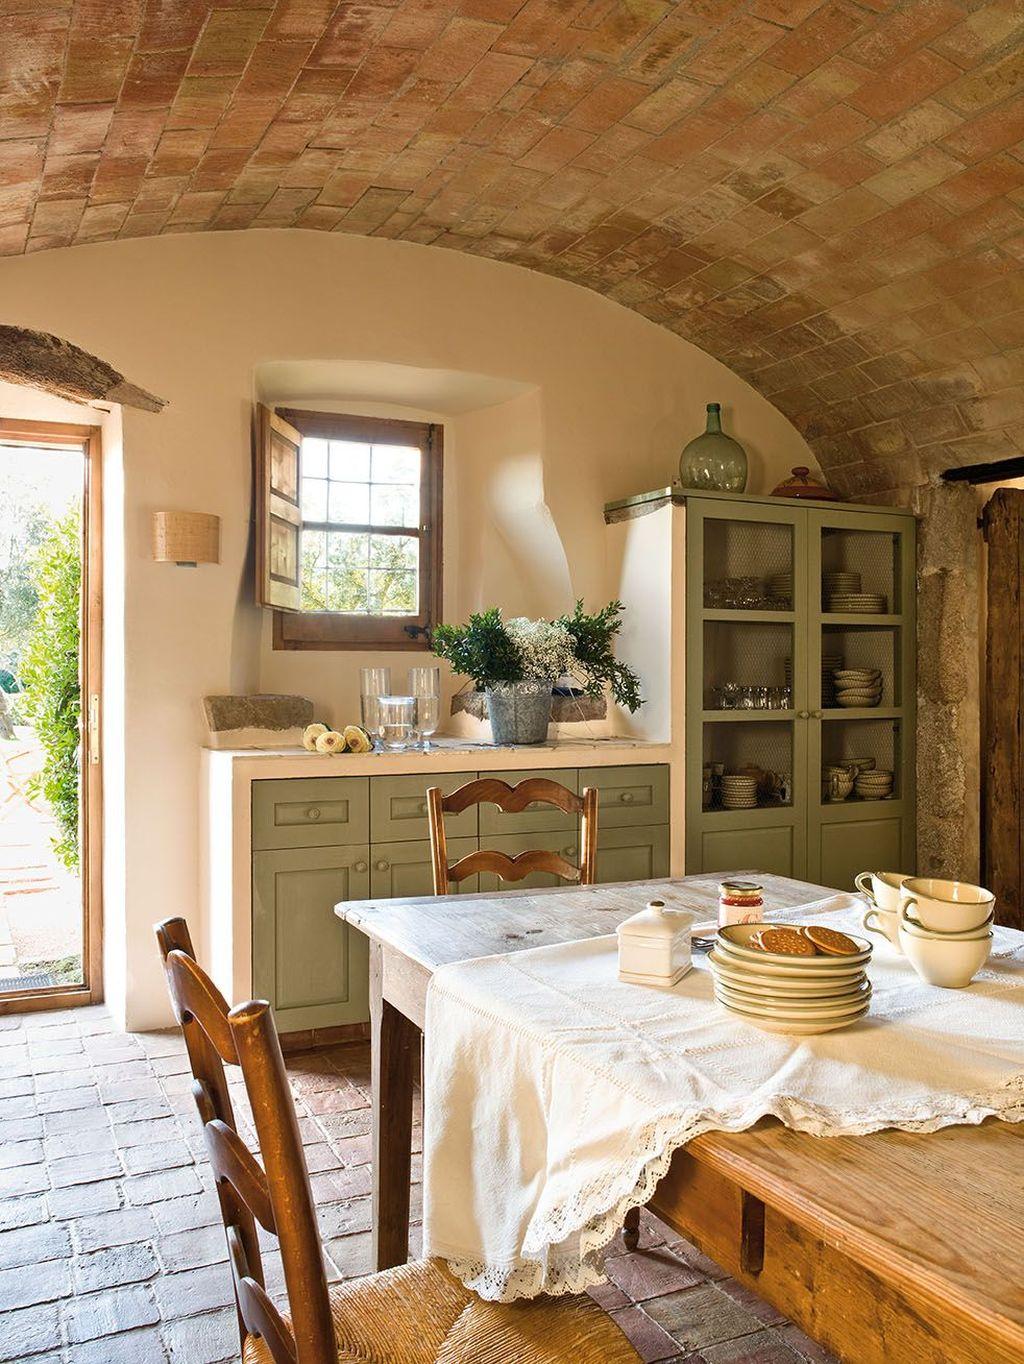 Fabulous Rustic Italian Decor Ideas For Your Home 29